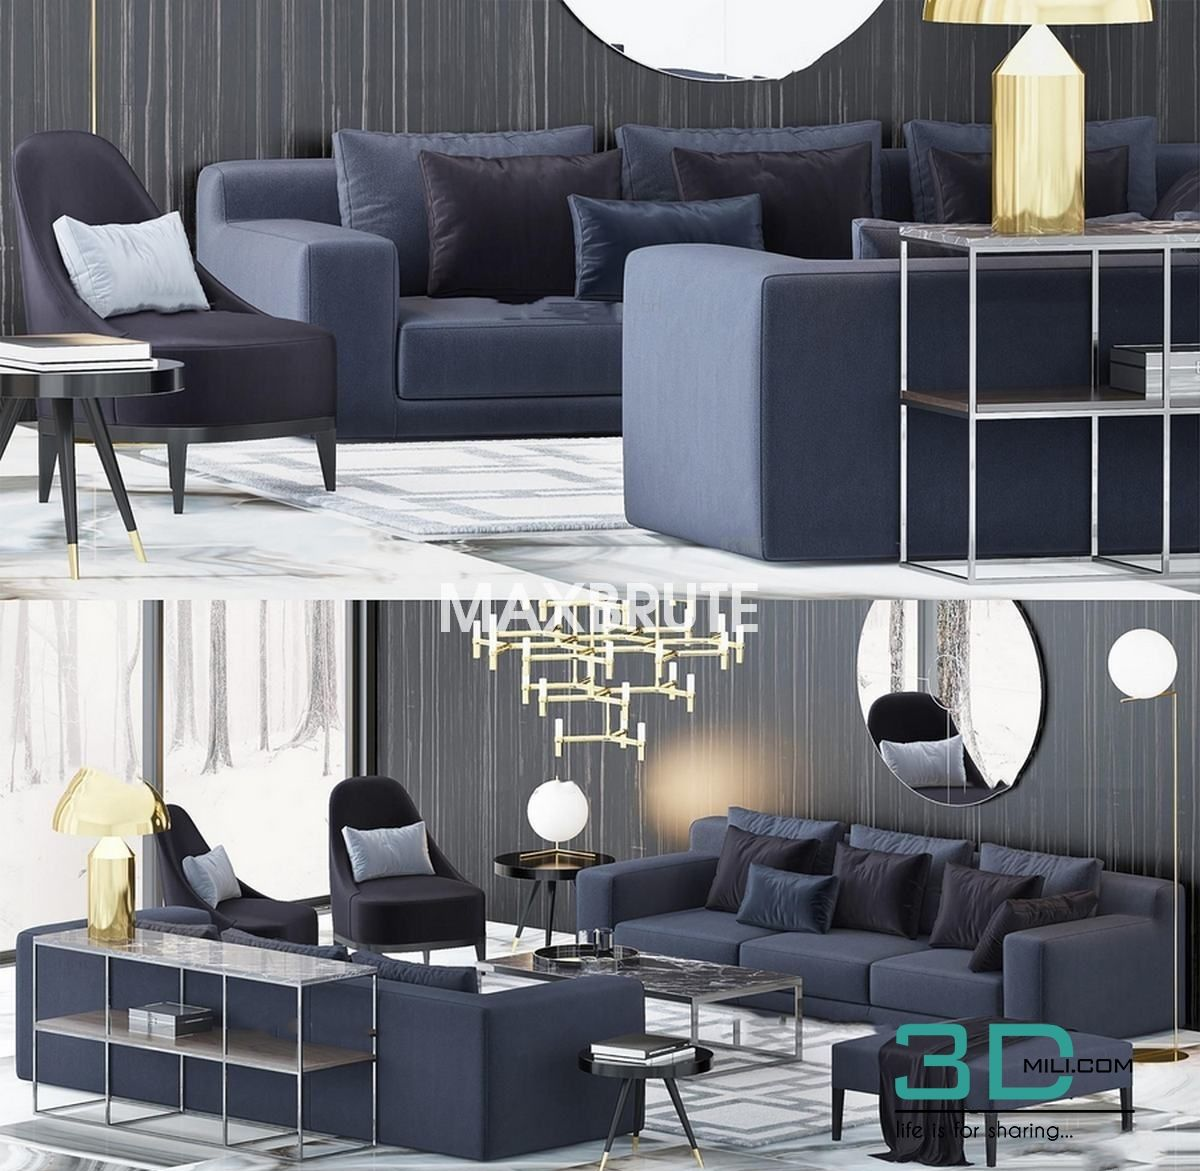 0f571a04e196 Luxury Sofas- Luxury Armchairs - 3D Mili - Download 3D Model - Free 3D  Models - 3D Model Download